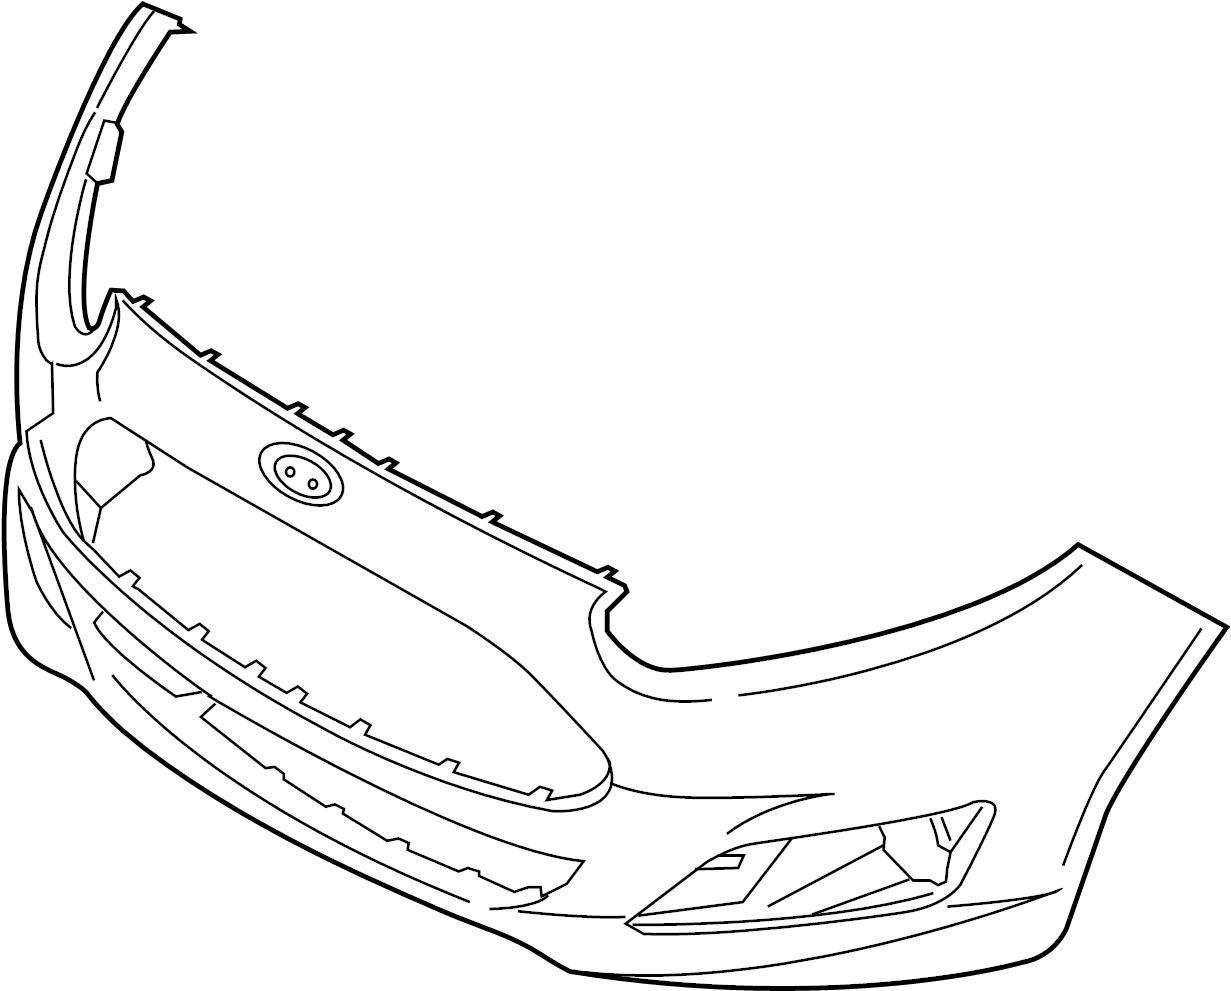 2013 Hyundai Genesis Wiring Diagram Master Blogs Ford Fiesta Front Bumper Parts Imageresizertool Com Speedometer Coupe Headlight